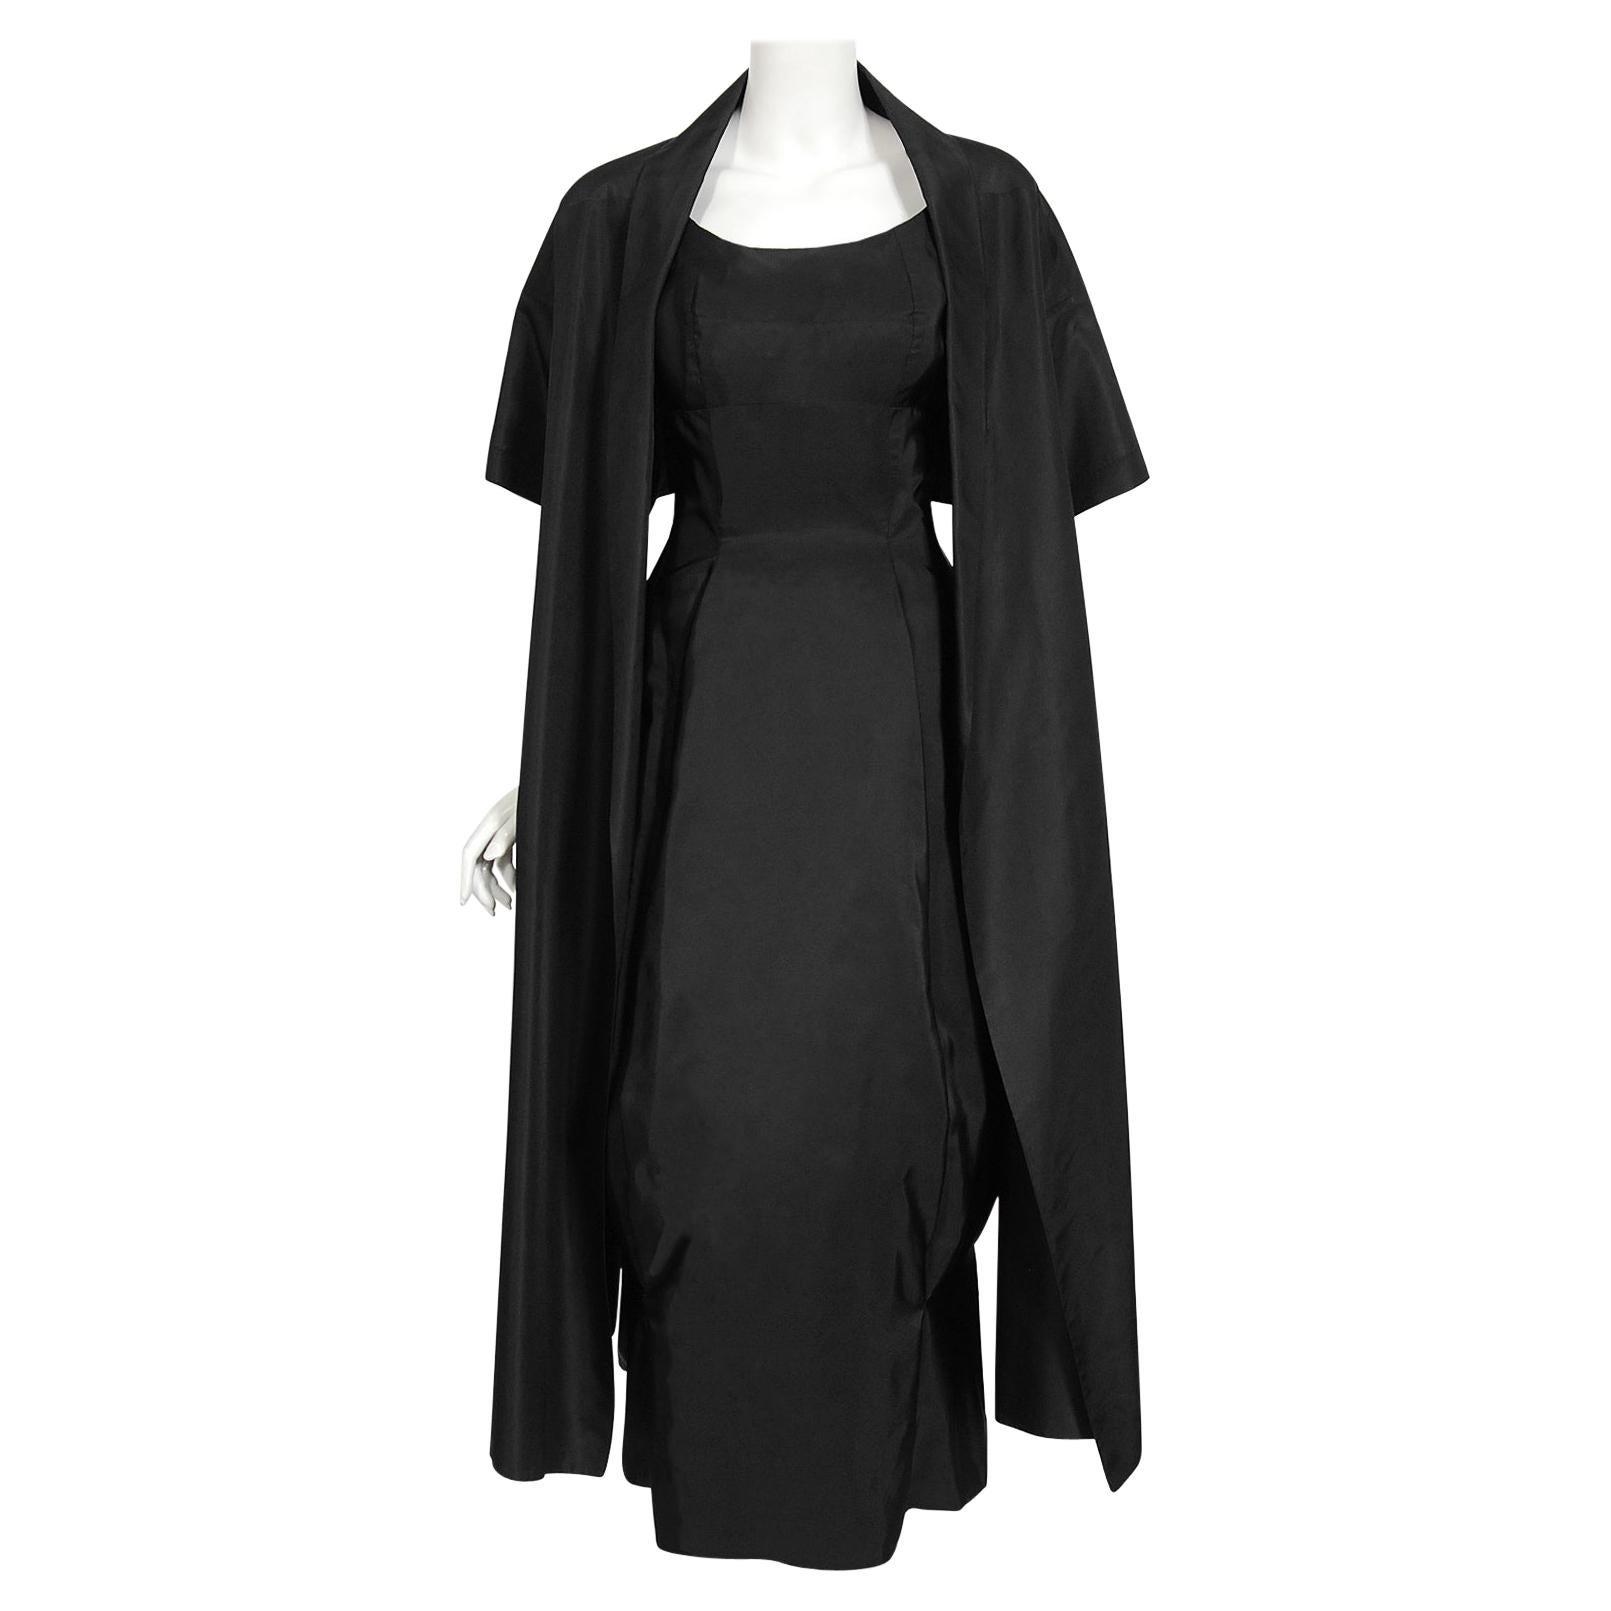 Vintage 1950's Madame Grès Haute Couture Sculpted Silk Back-Bow Dress & Jacket